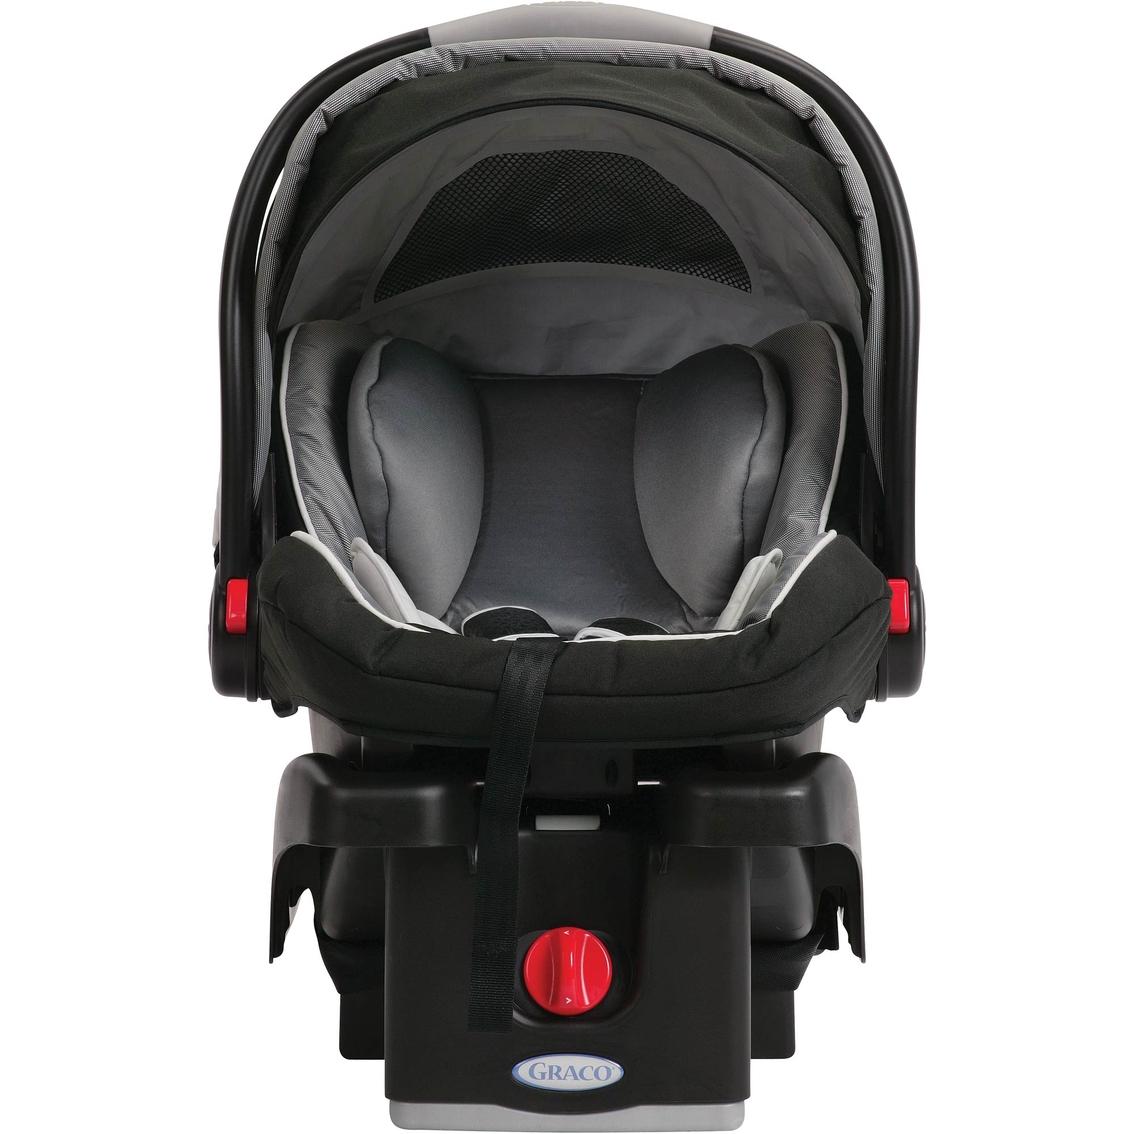 graco snugride click connect 35 lx infant car seat harris infant seats baby toys shop. Black Bedroom Furniture Sets. Home Design Ideas